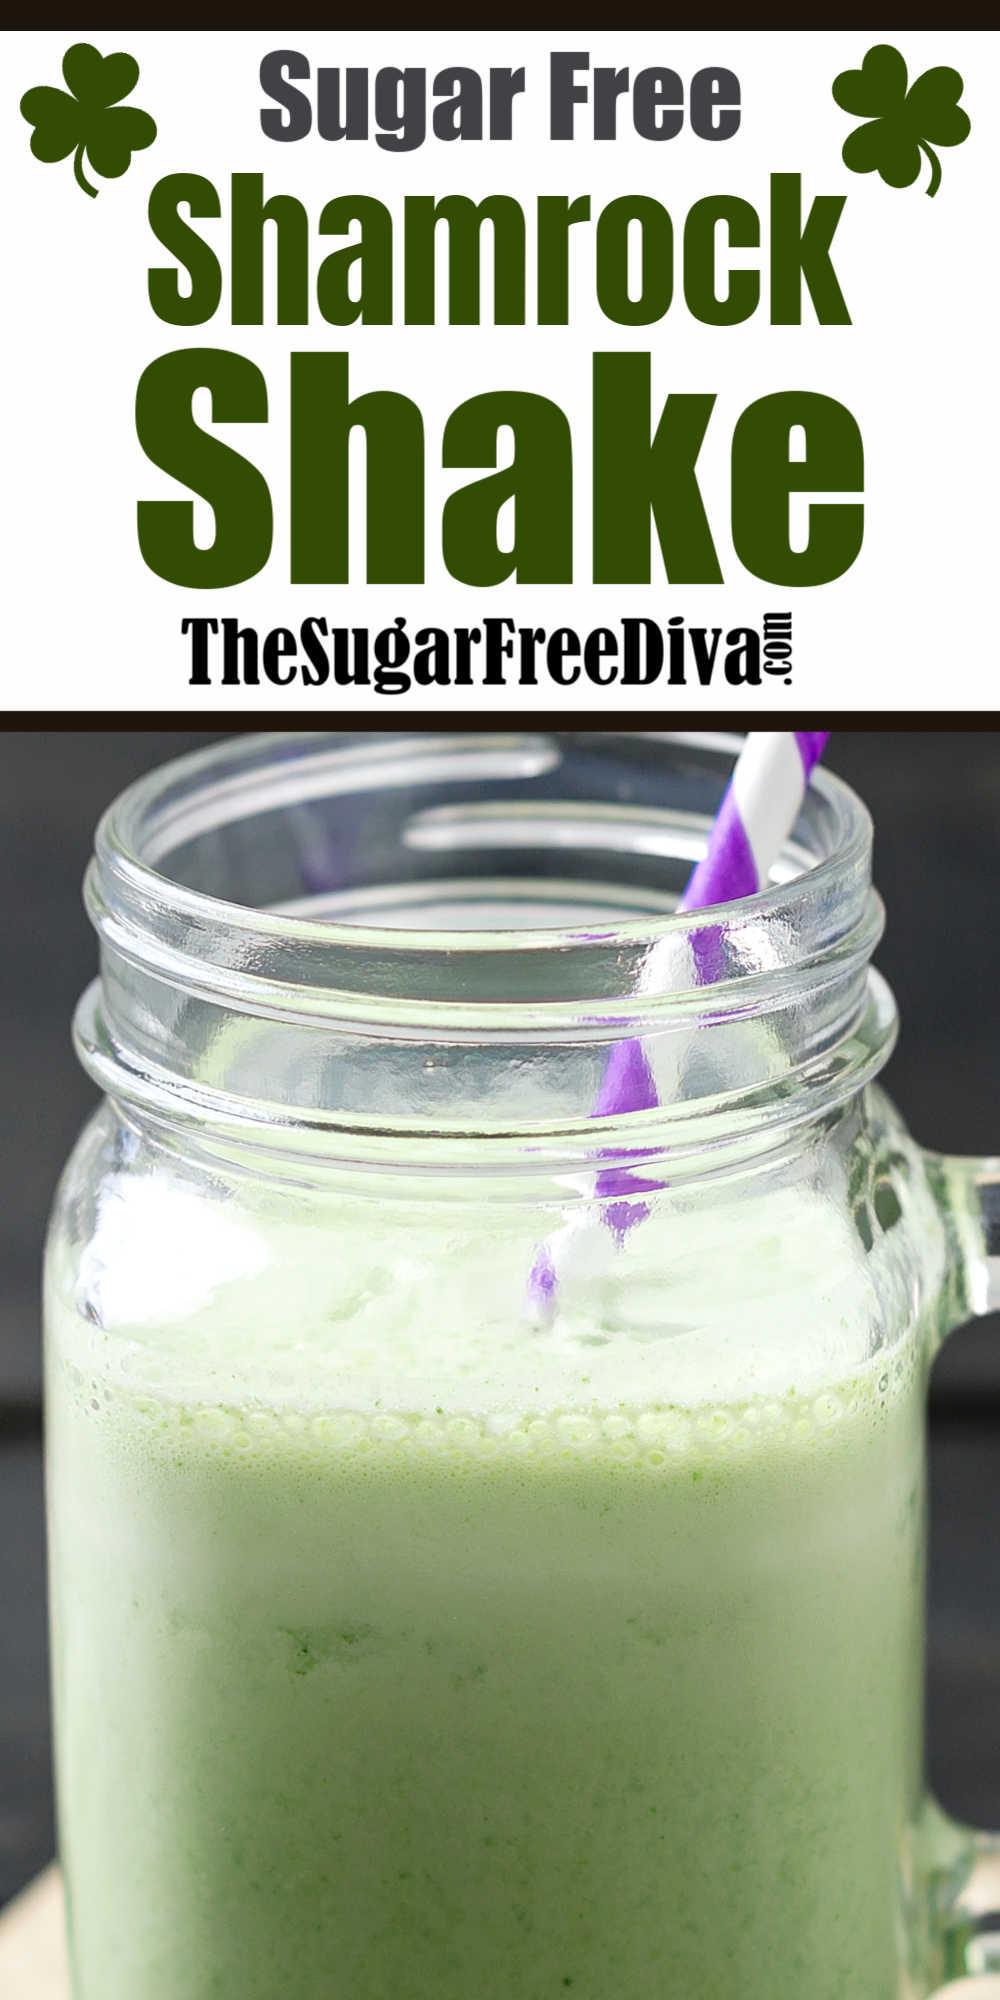 How to make a Sugar Free Shamrock Shake